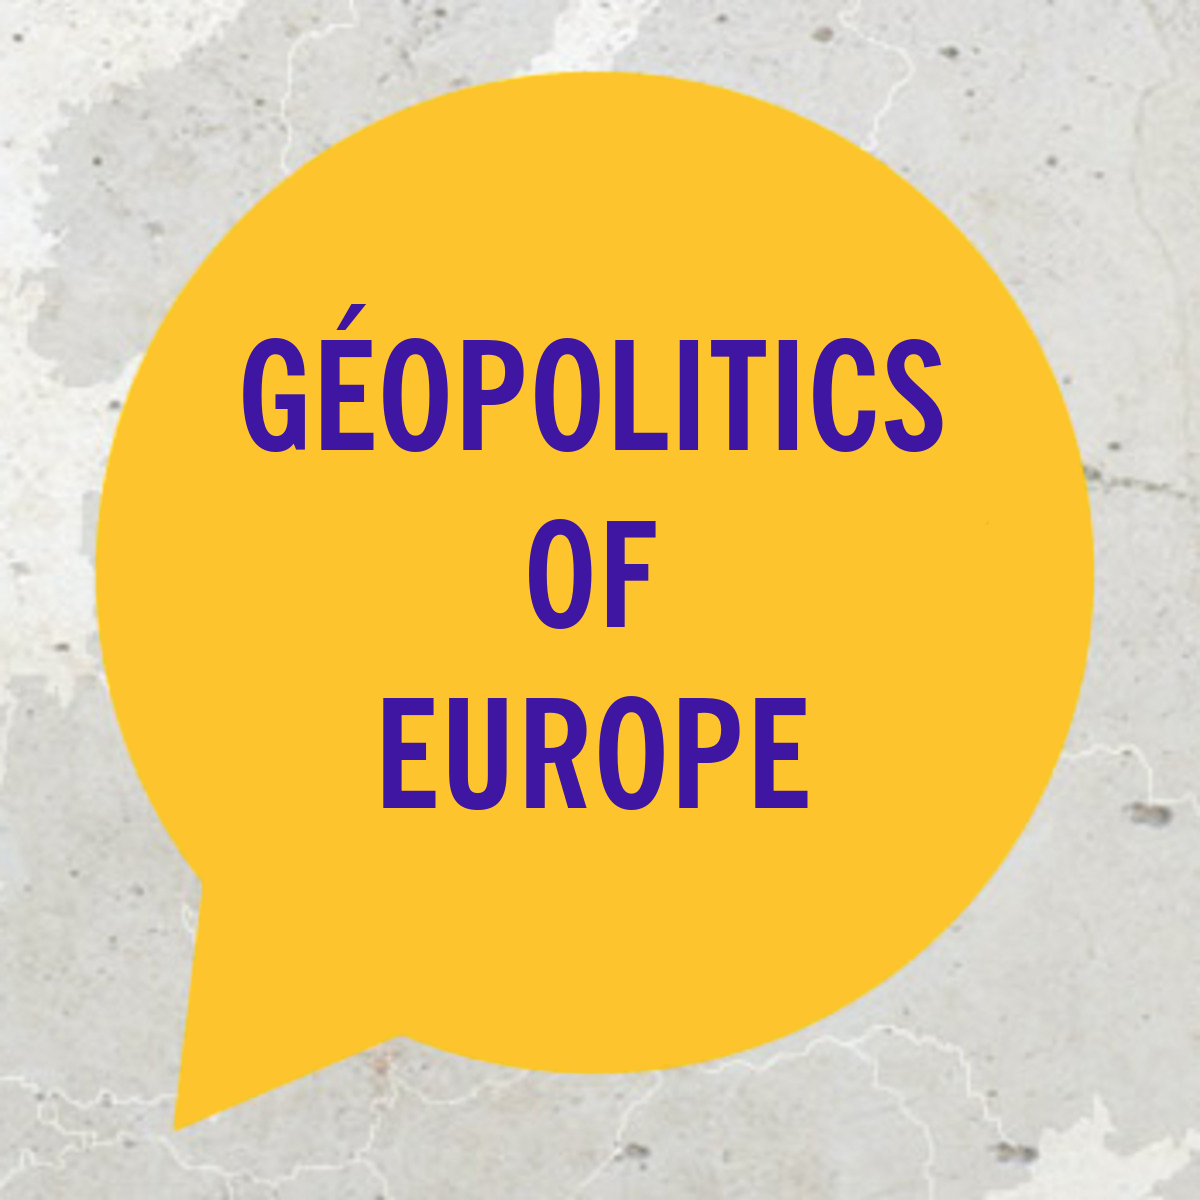 Geopolitics of Europe course image